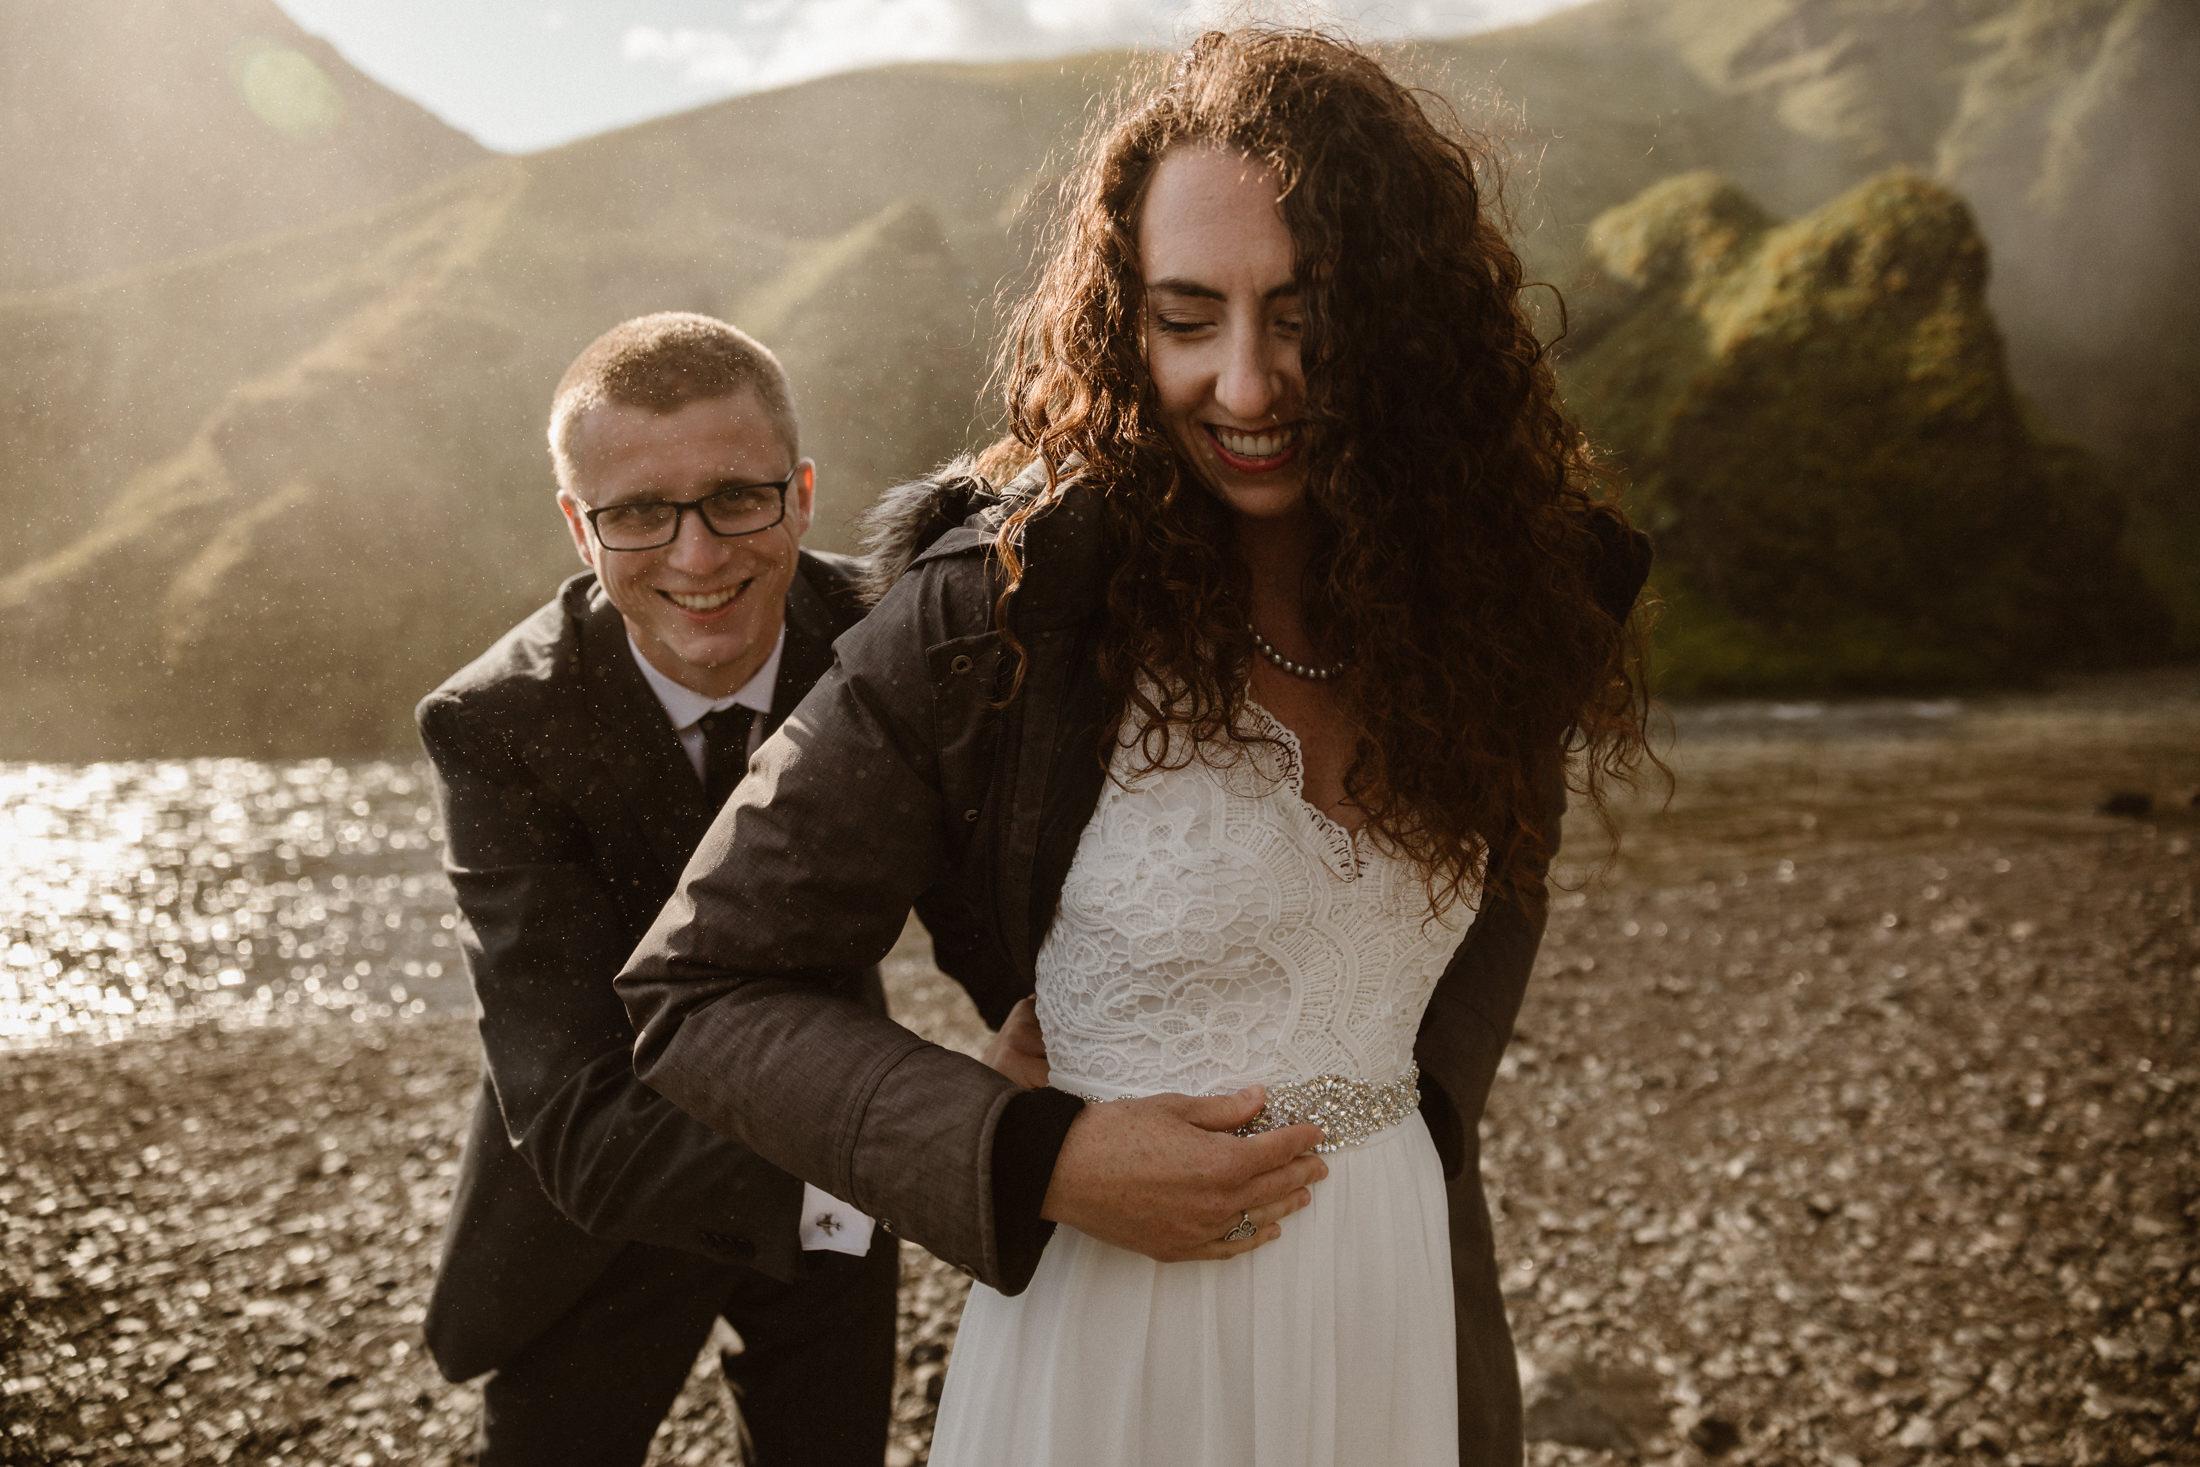 elopement-photos-at-skogafoss-waterfall-in-iceland-narrowleaf-adventure-photography-4642.JPG